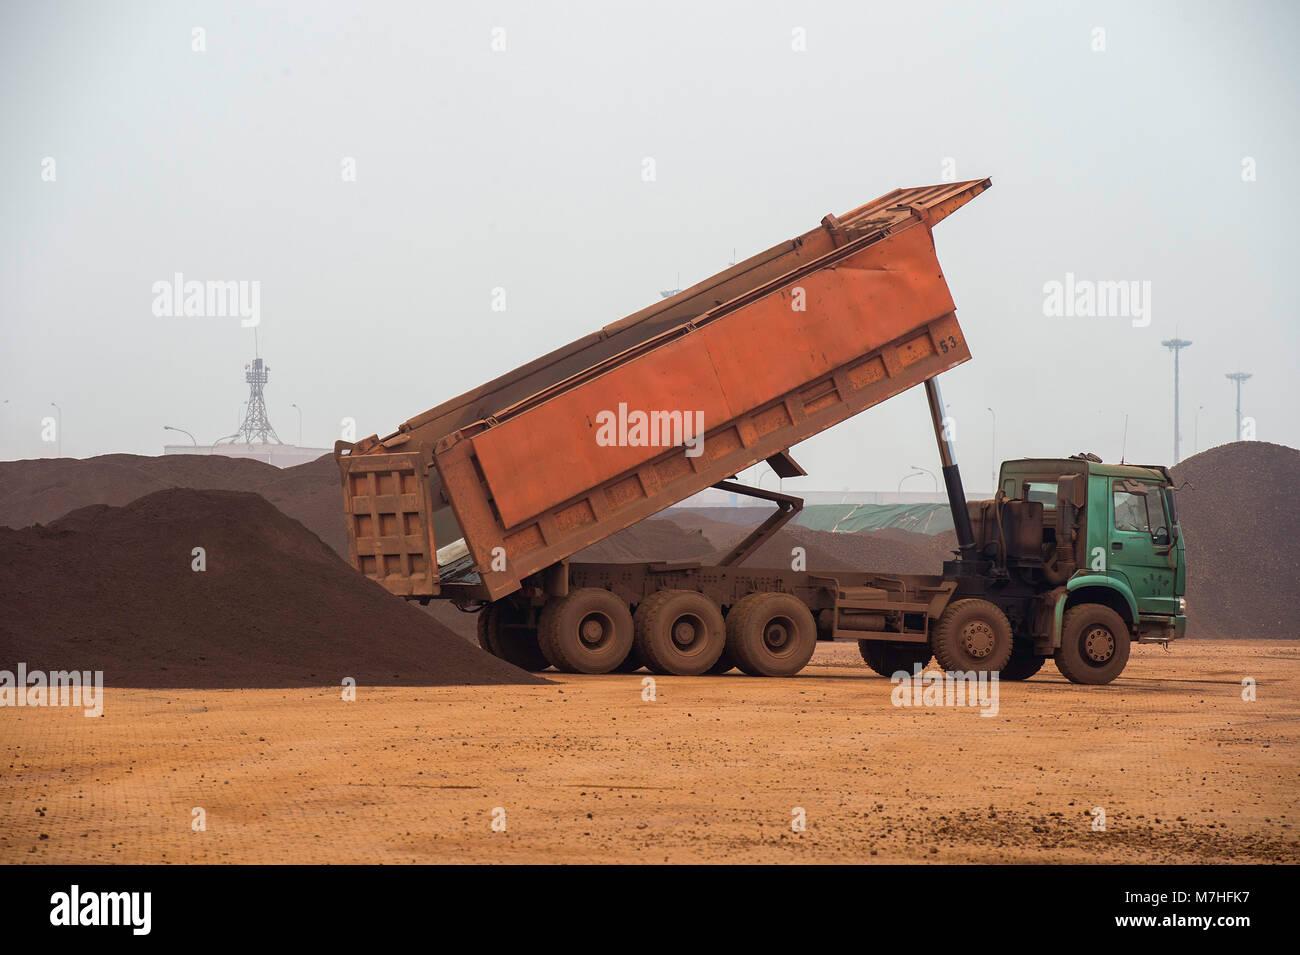 Iron Ore stockpile storage on the docks in Tianjin Port China. - Stock Image